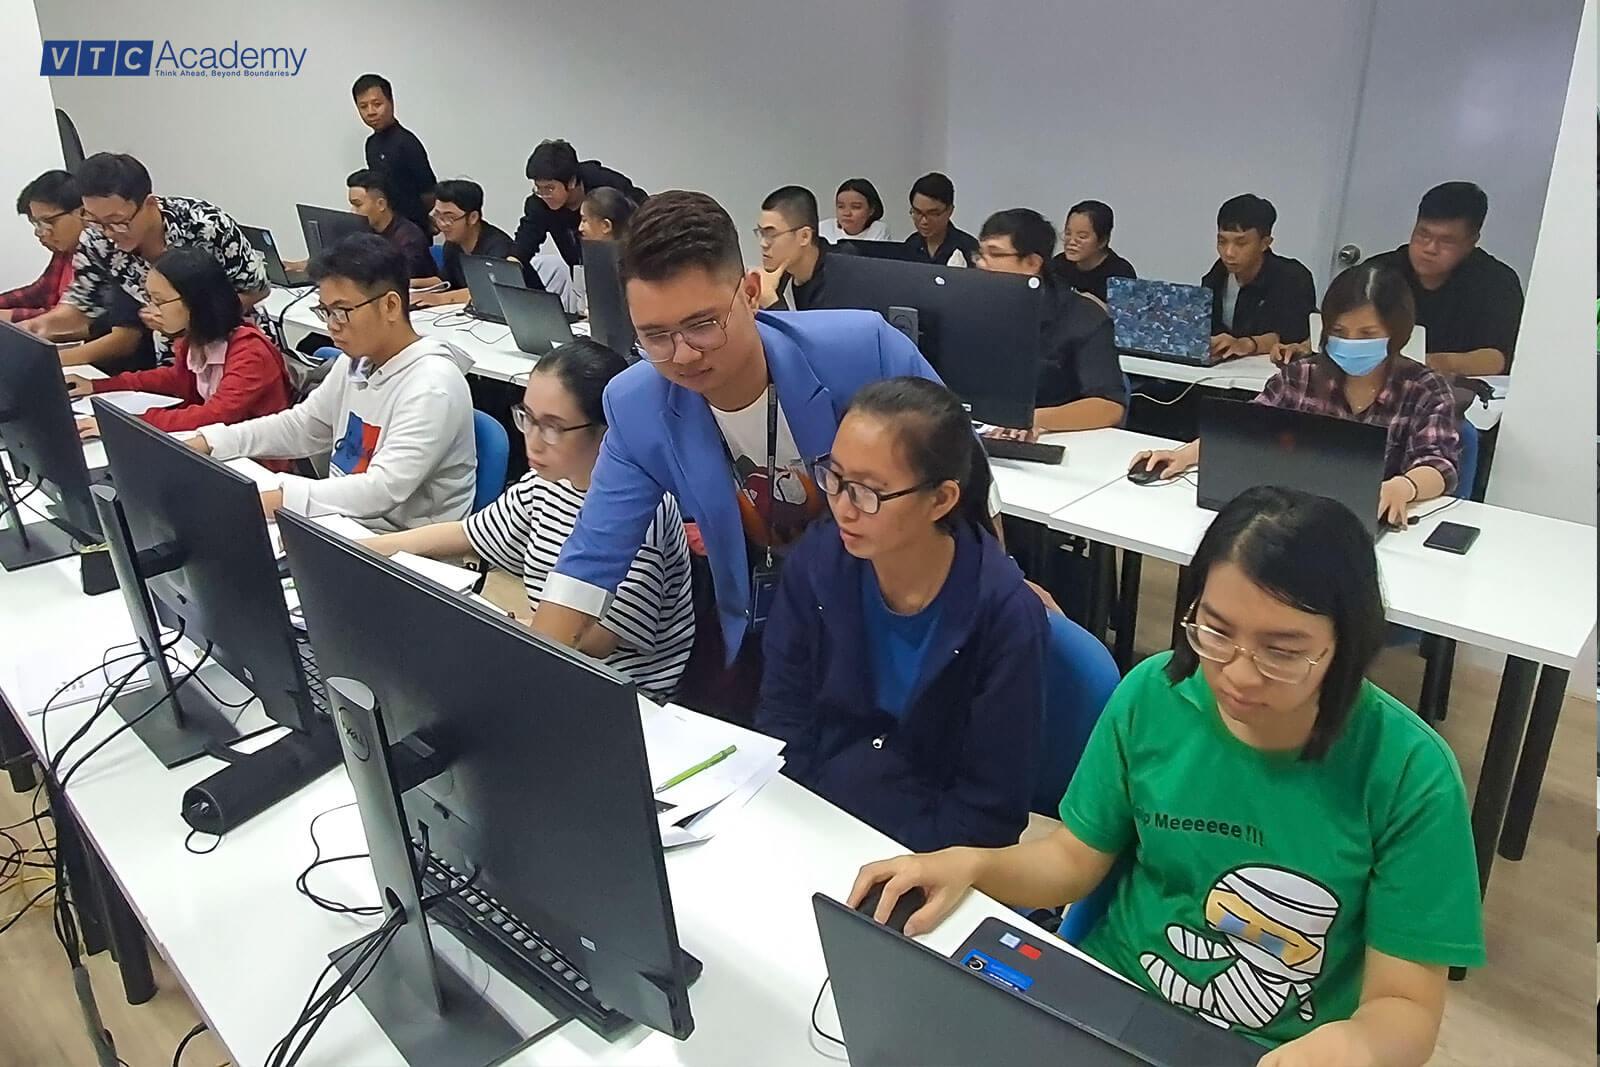 3d-modeling-bootcamp-vtc-academy-3